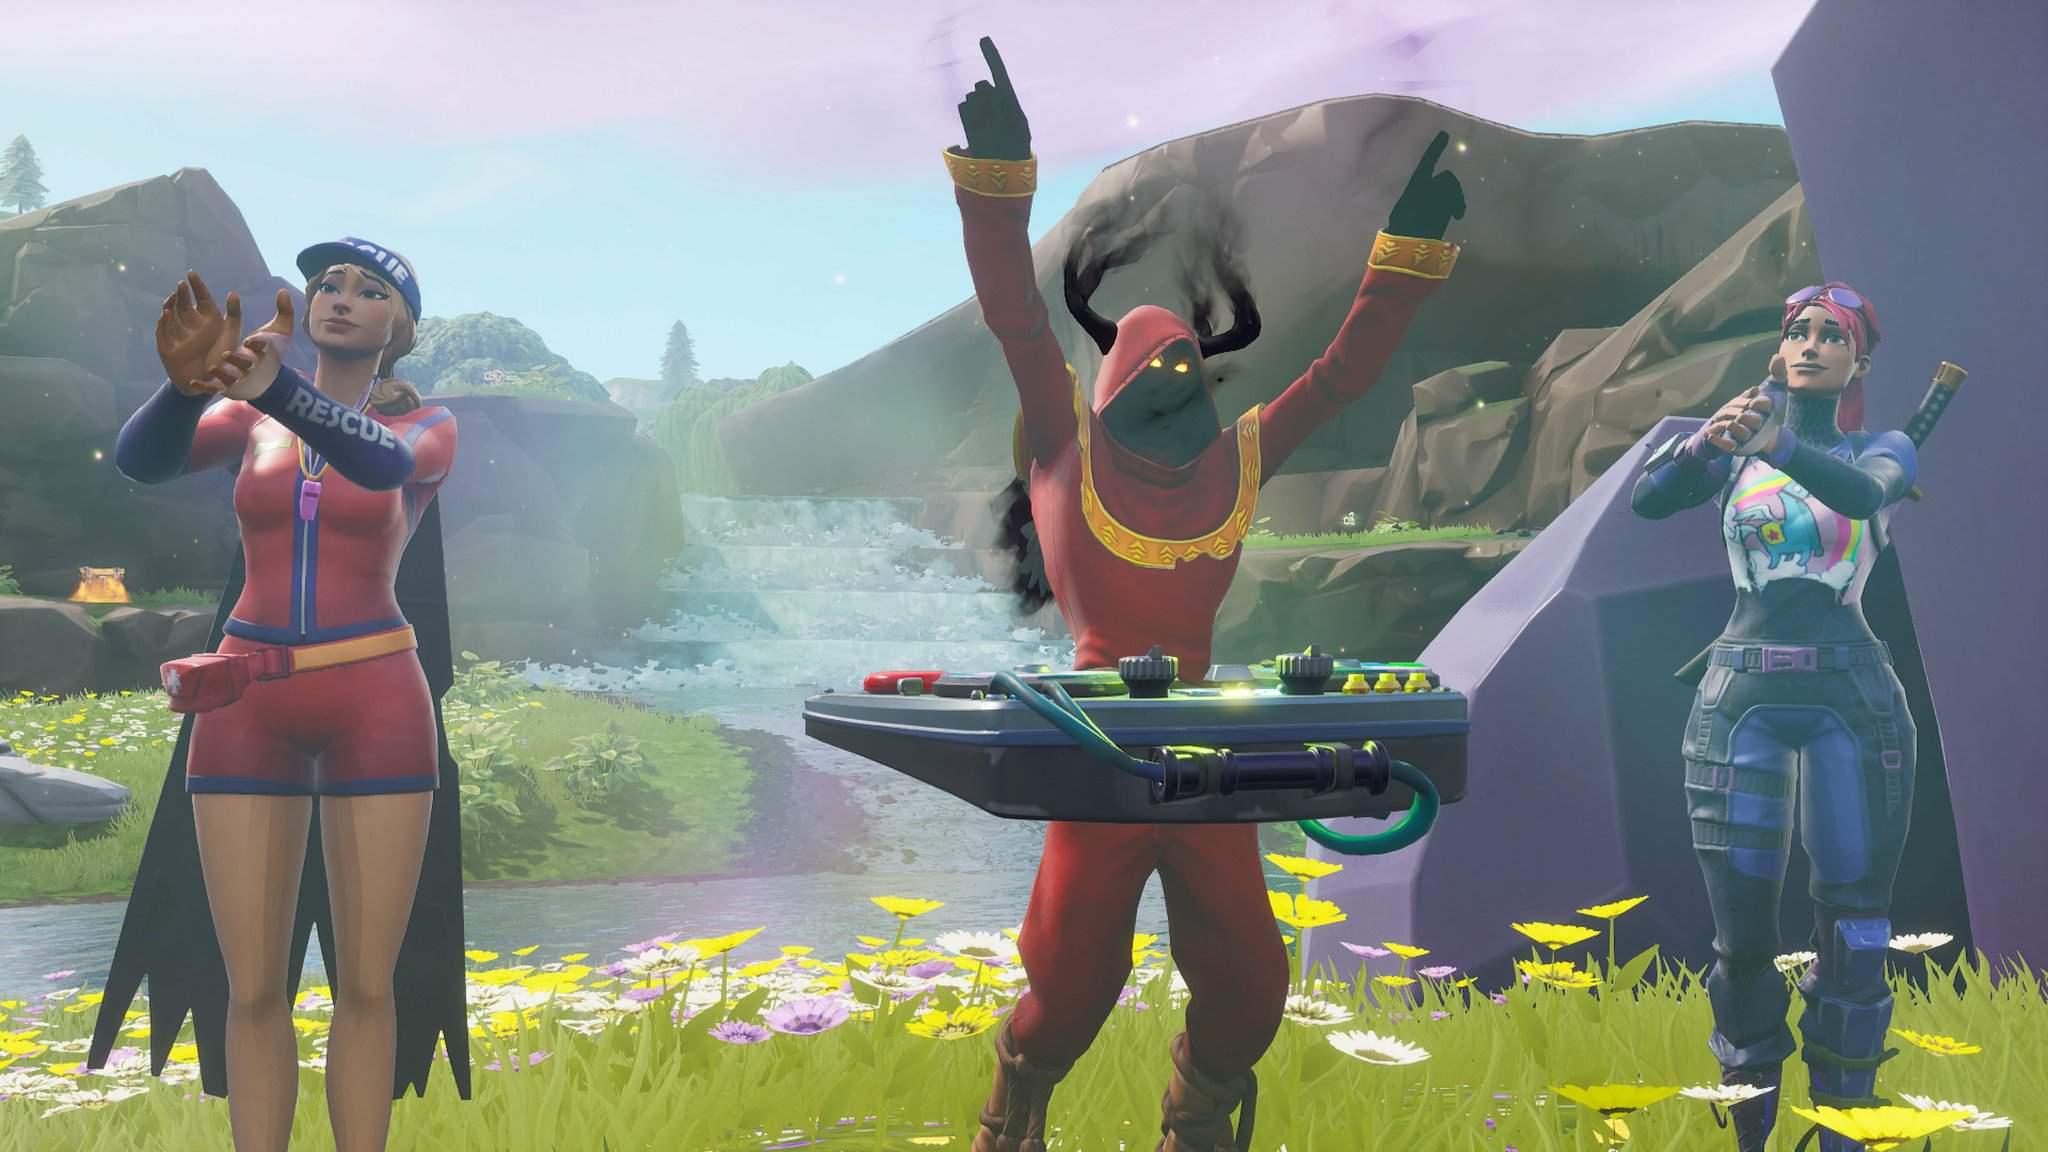 New item, Chug Splash, is coming to 'Fortnite Battle Royale'